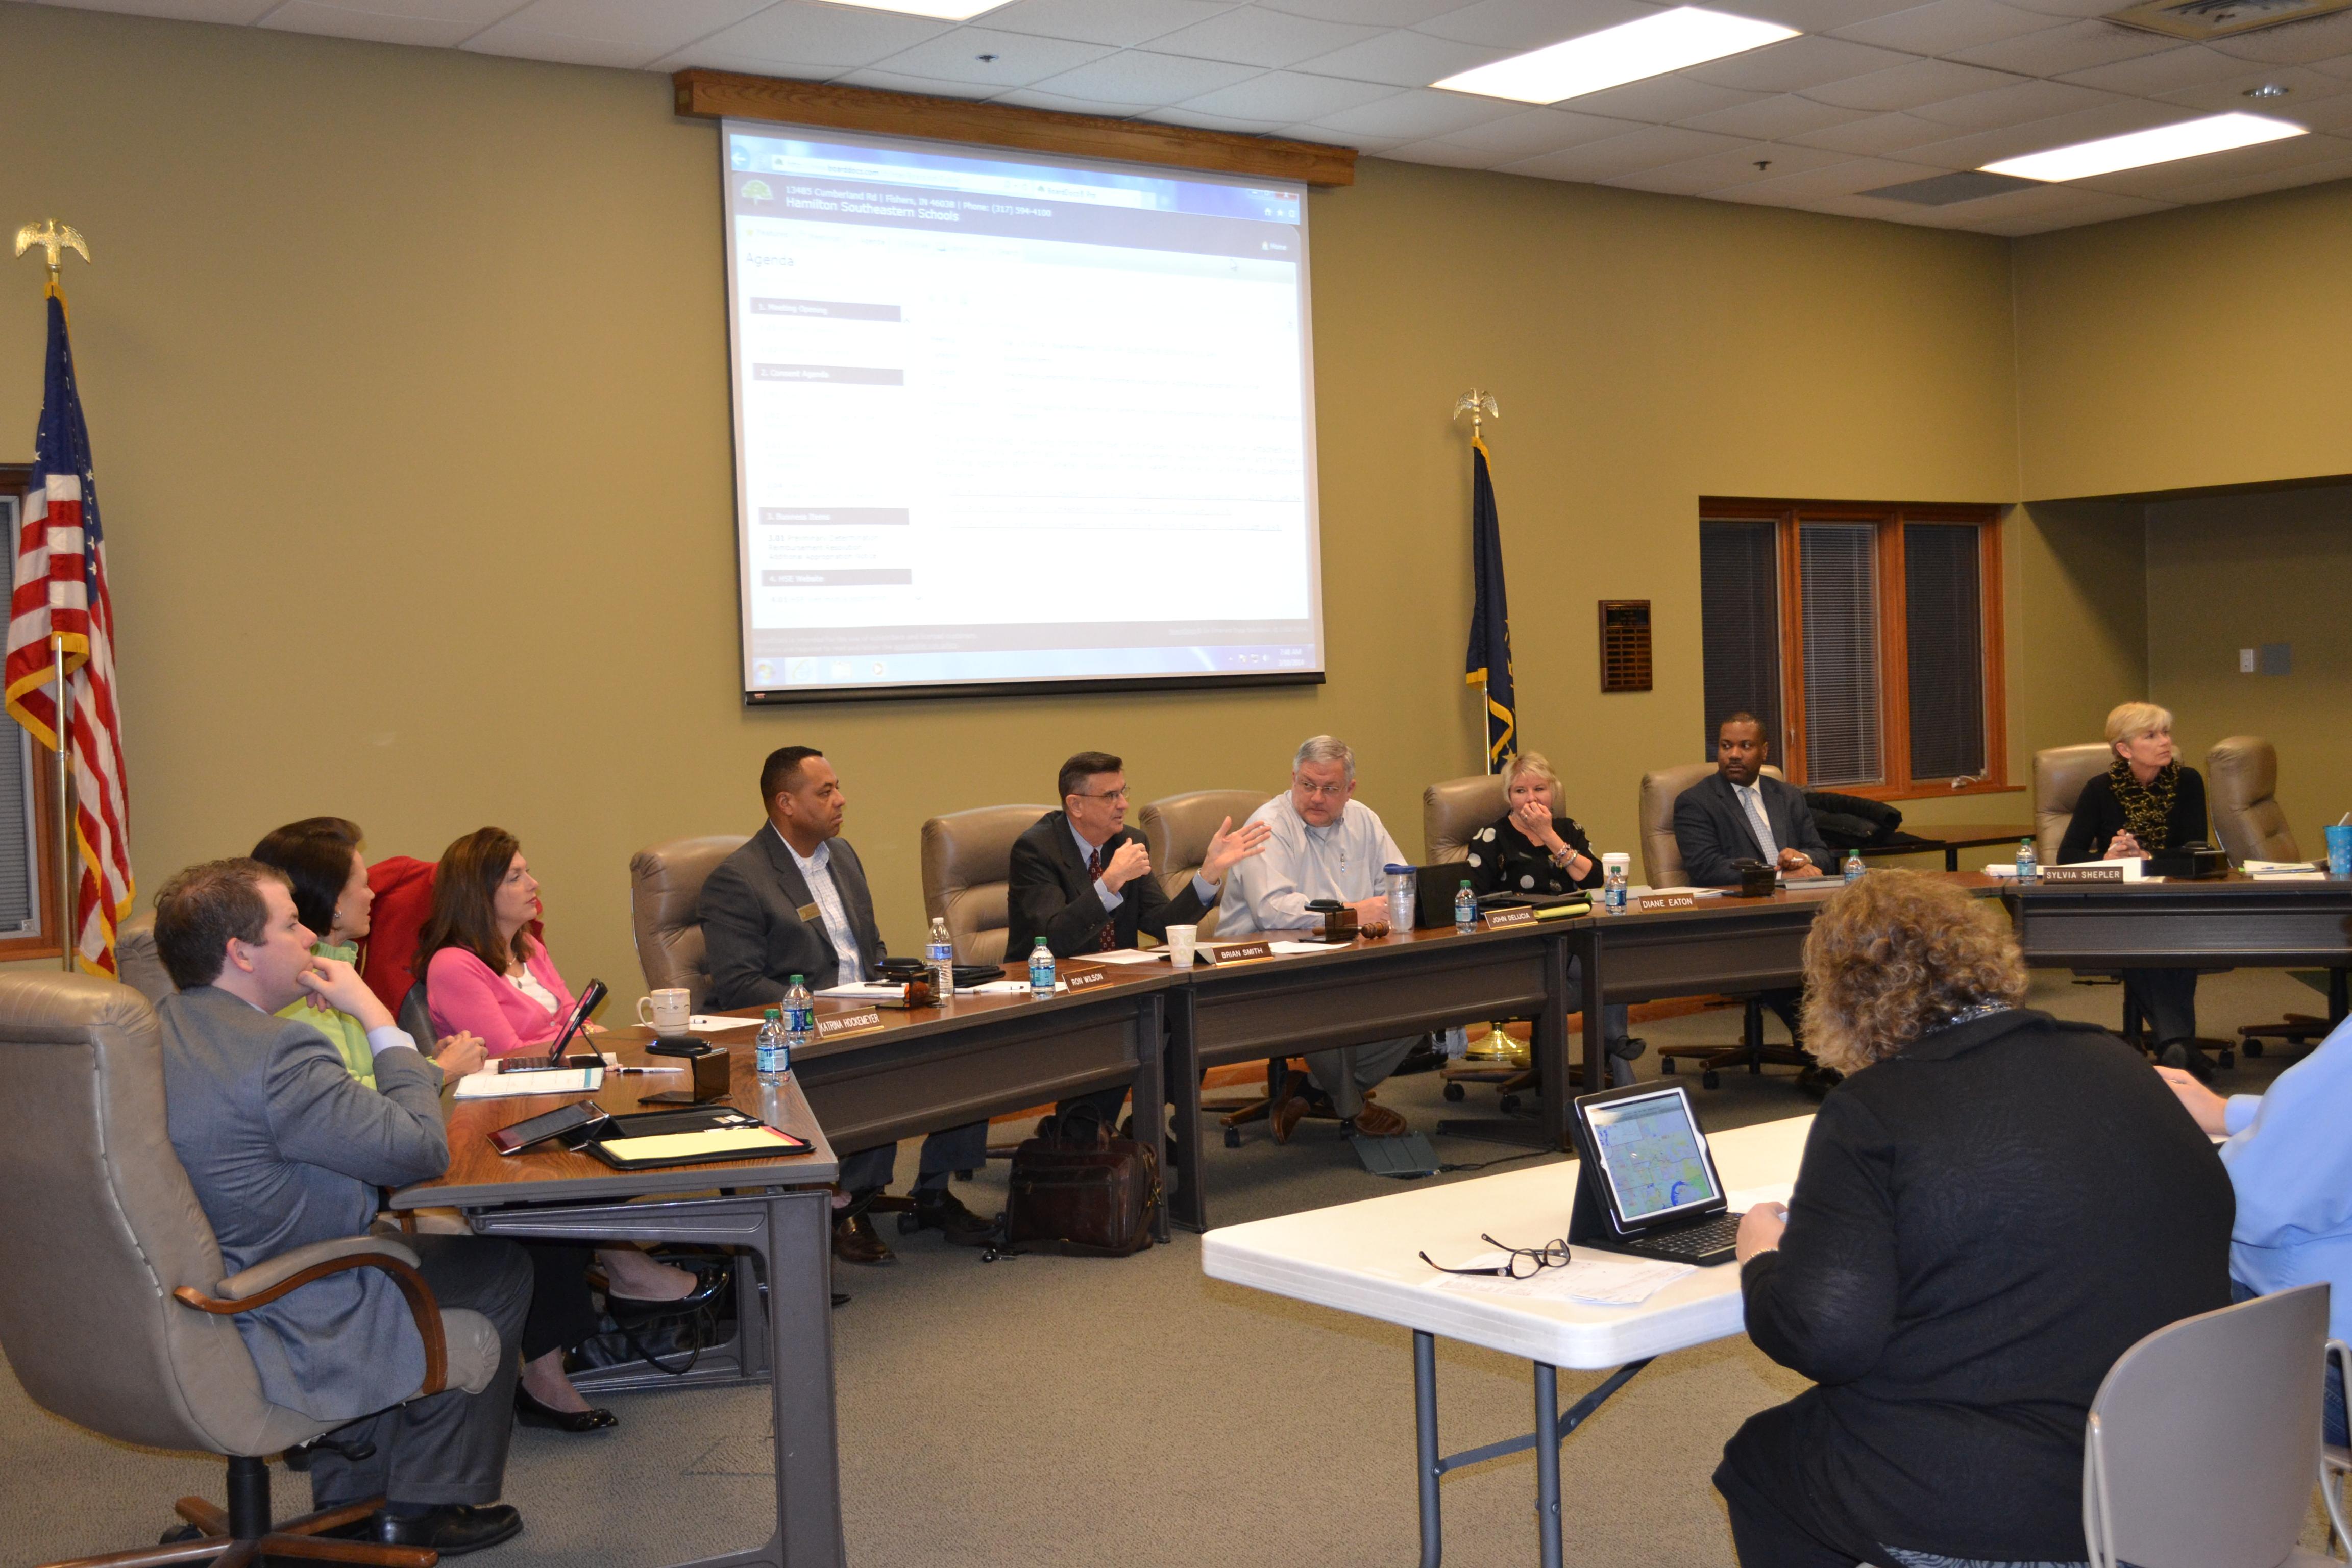 Hamilton Southeastern School Board members in discussion on March 10. (Photo by Ann Craig-Cinnamon)